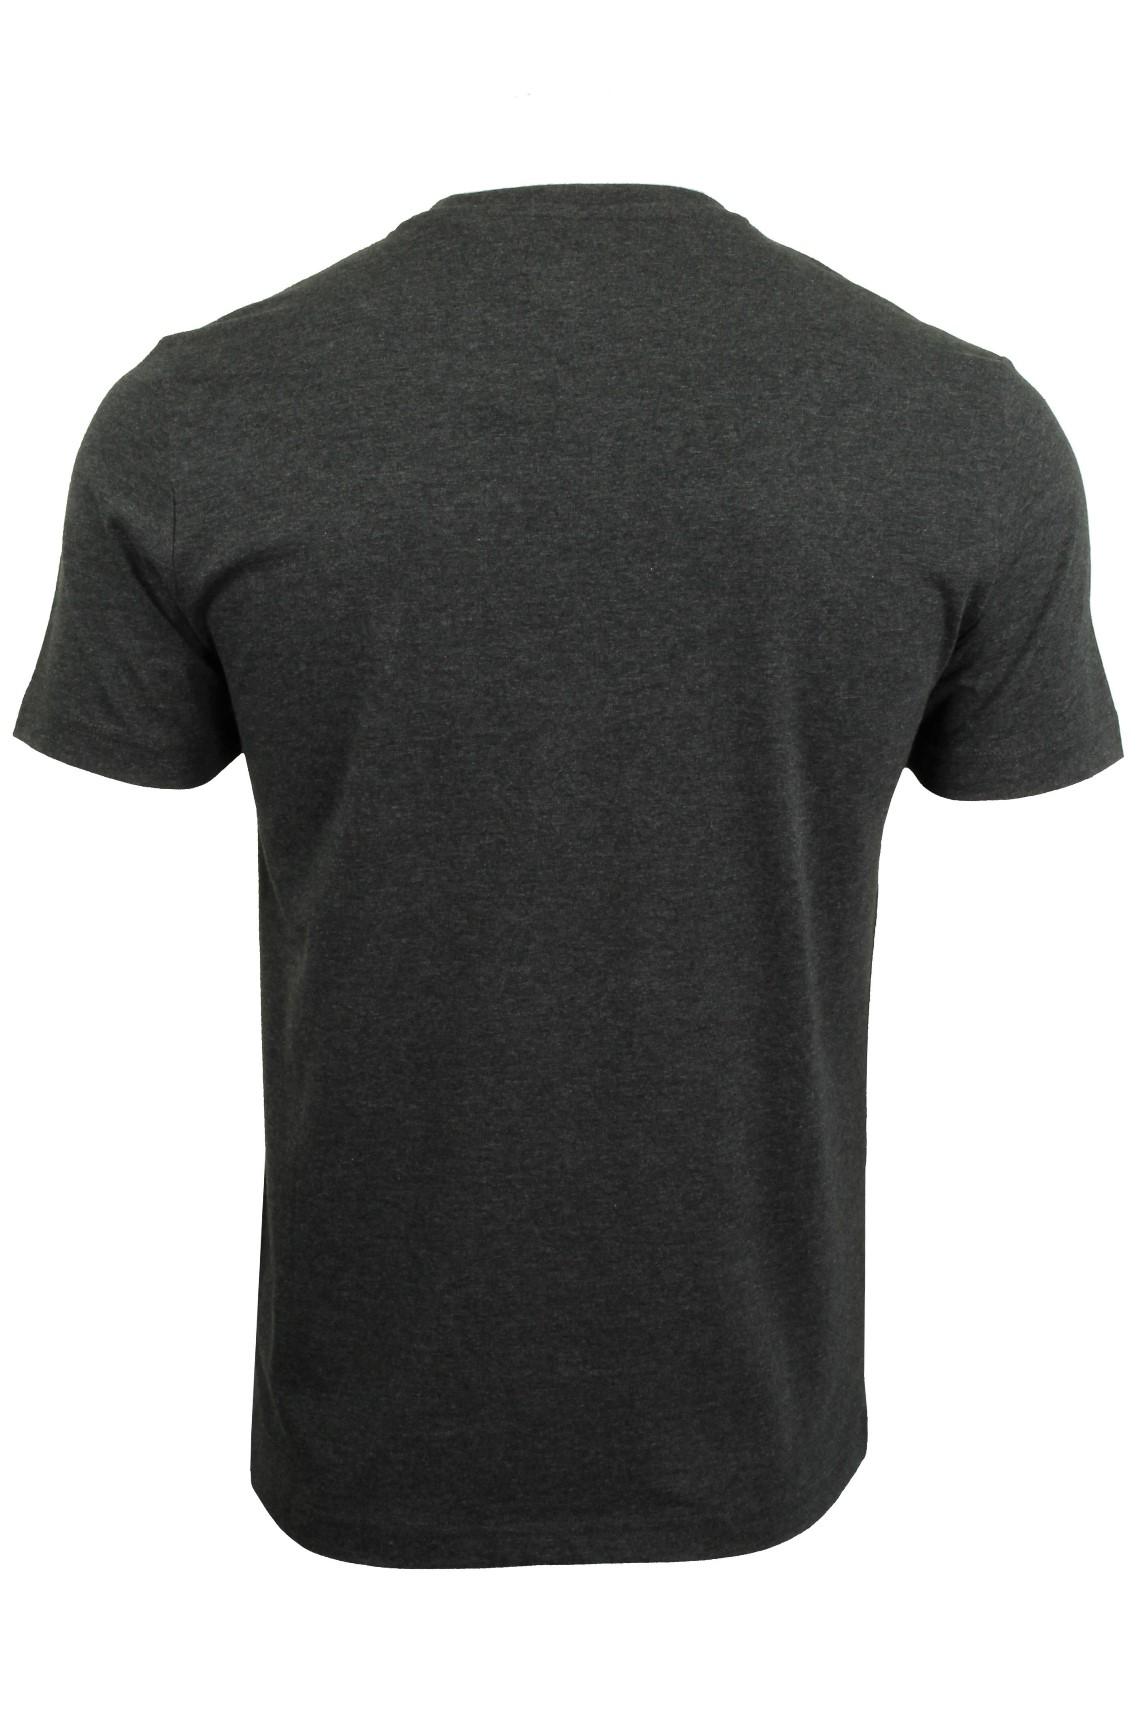 Mens-T-Shirt-by-Original-Penguin-Crew-Neck-Short-Sleeved thumbnail 14